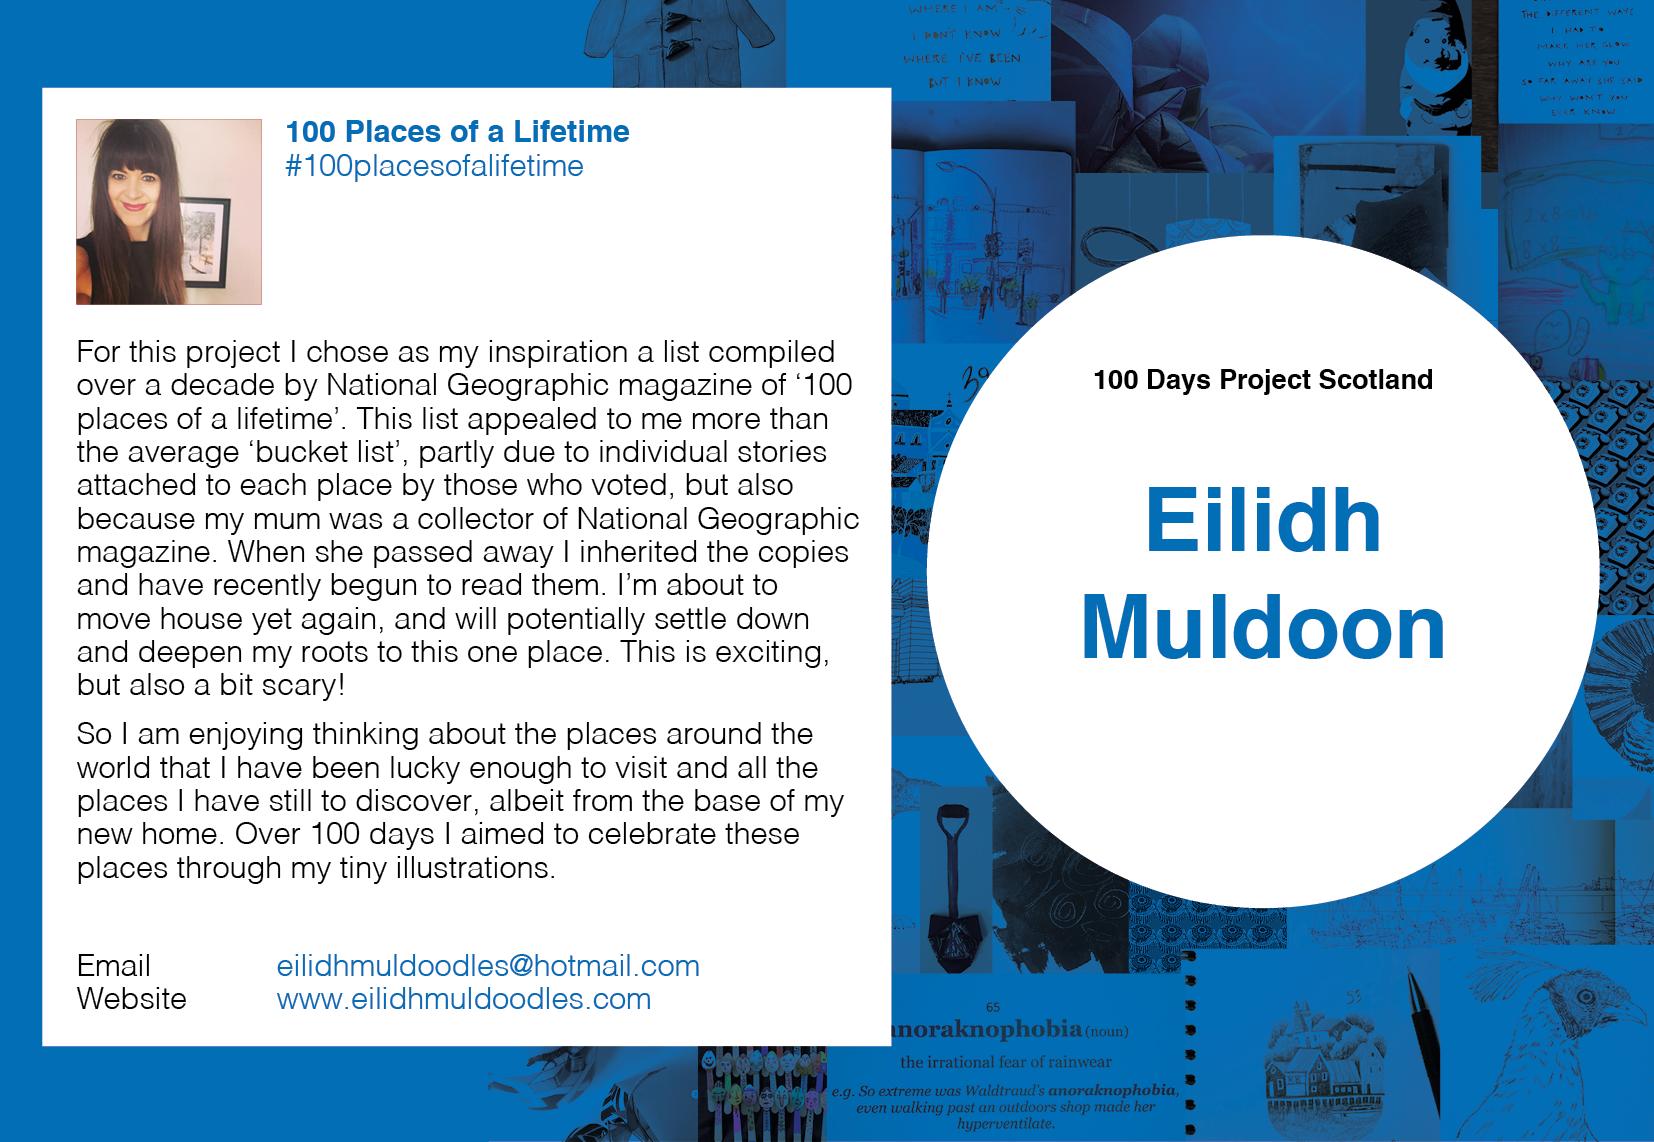 Eilidh Muldoon